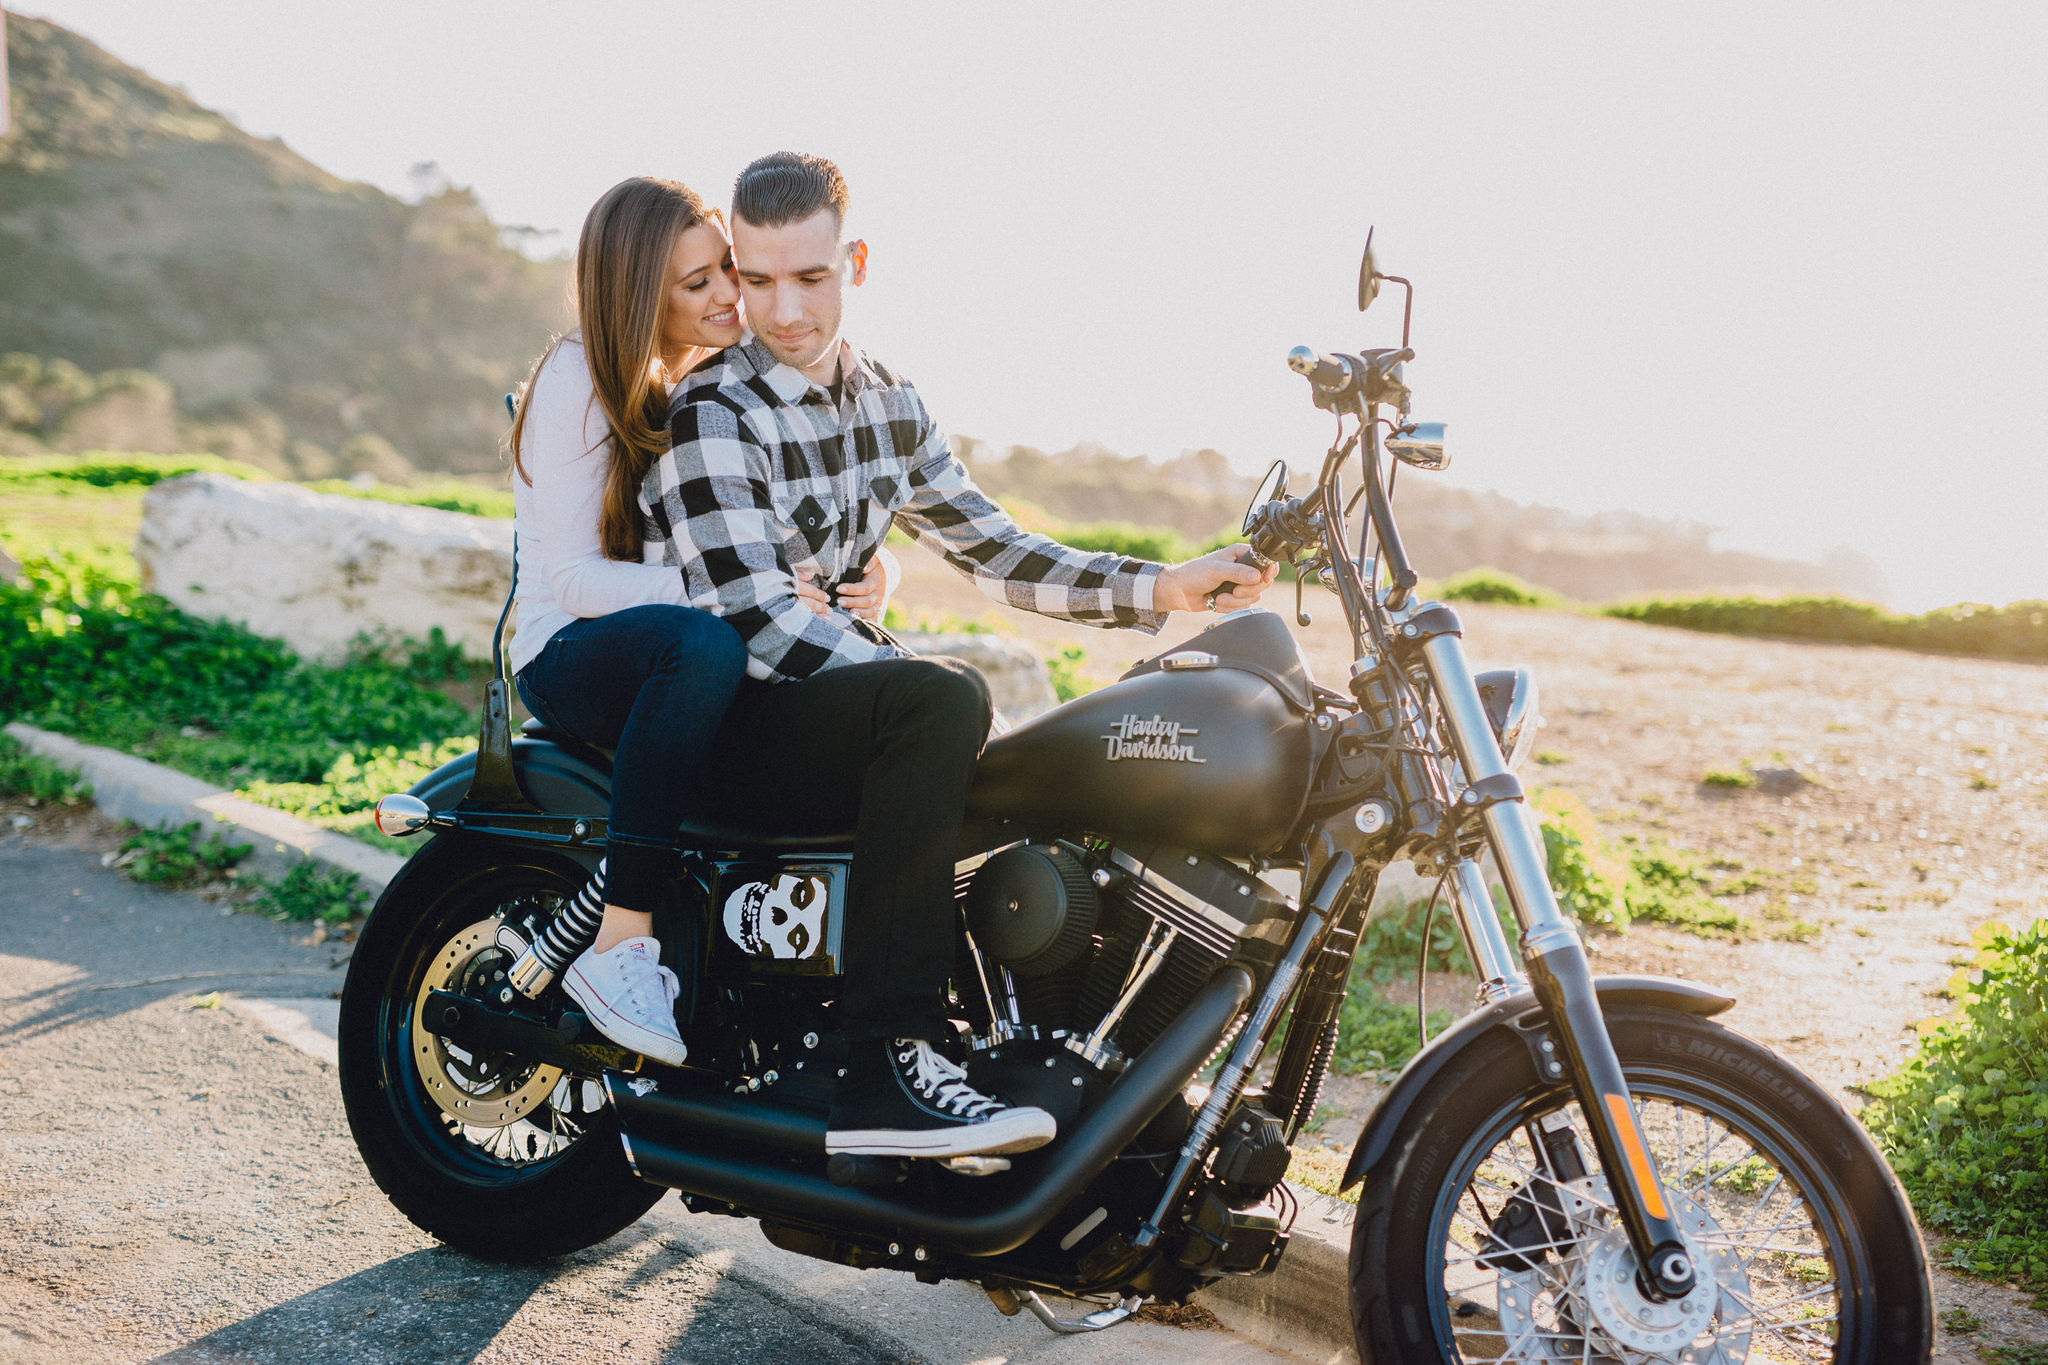 Harley Davidson | Palos Verdes